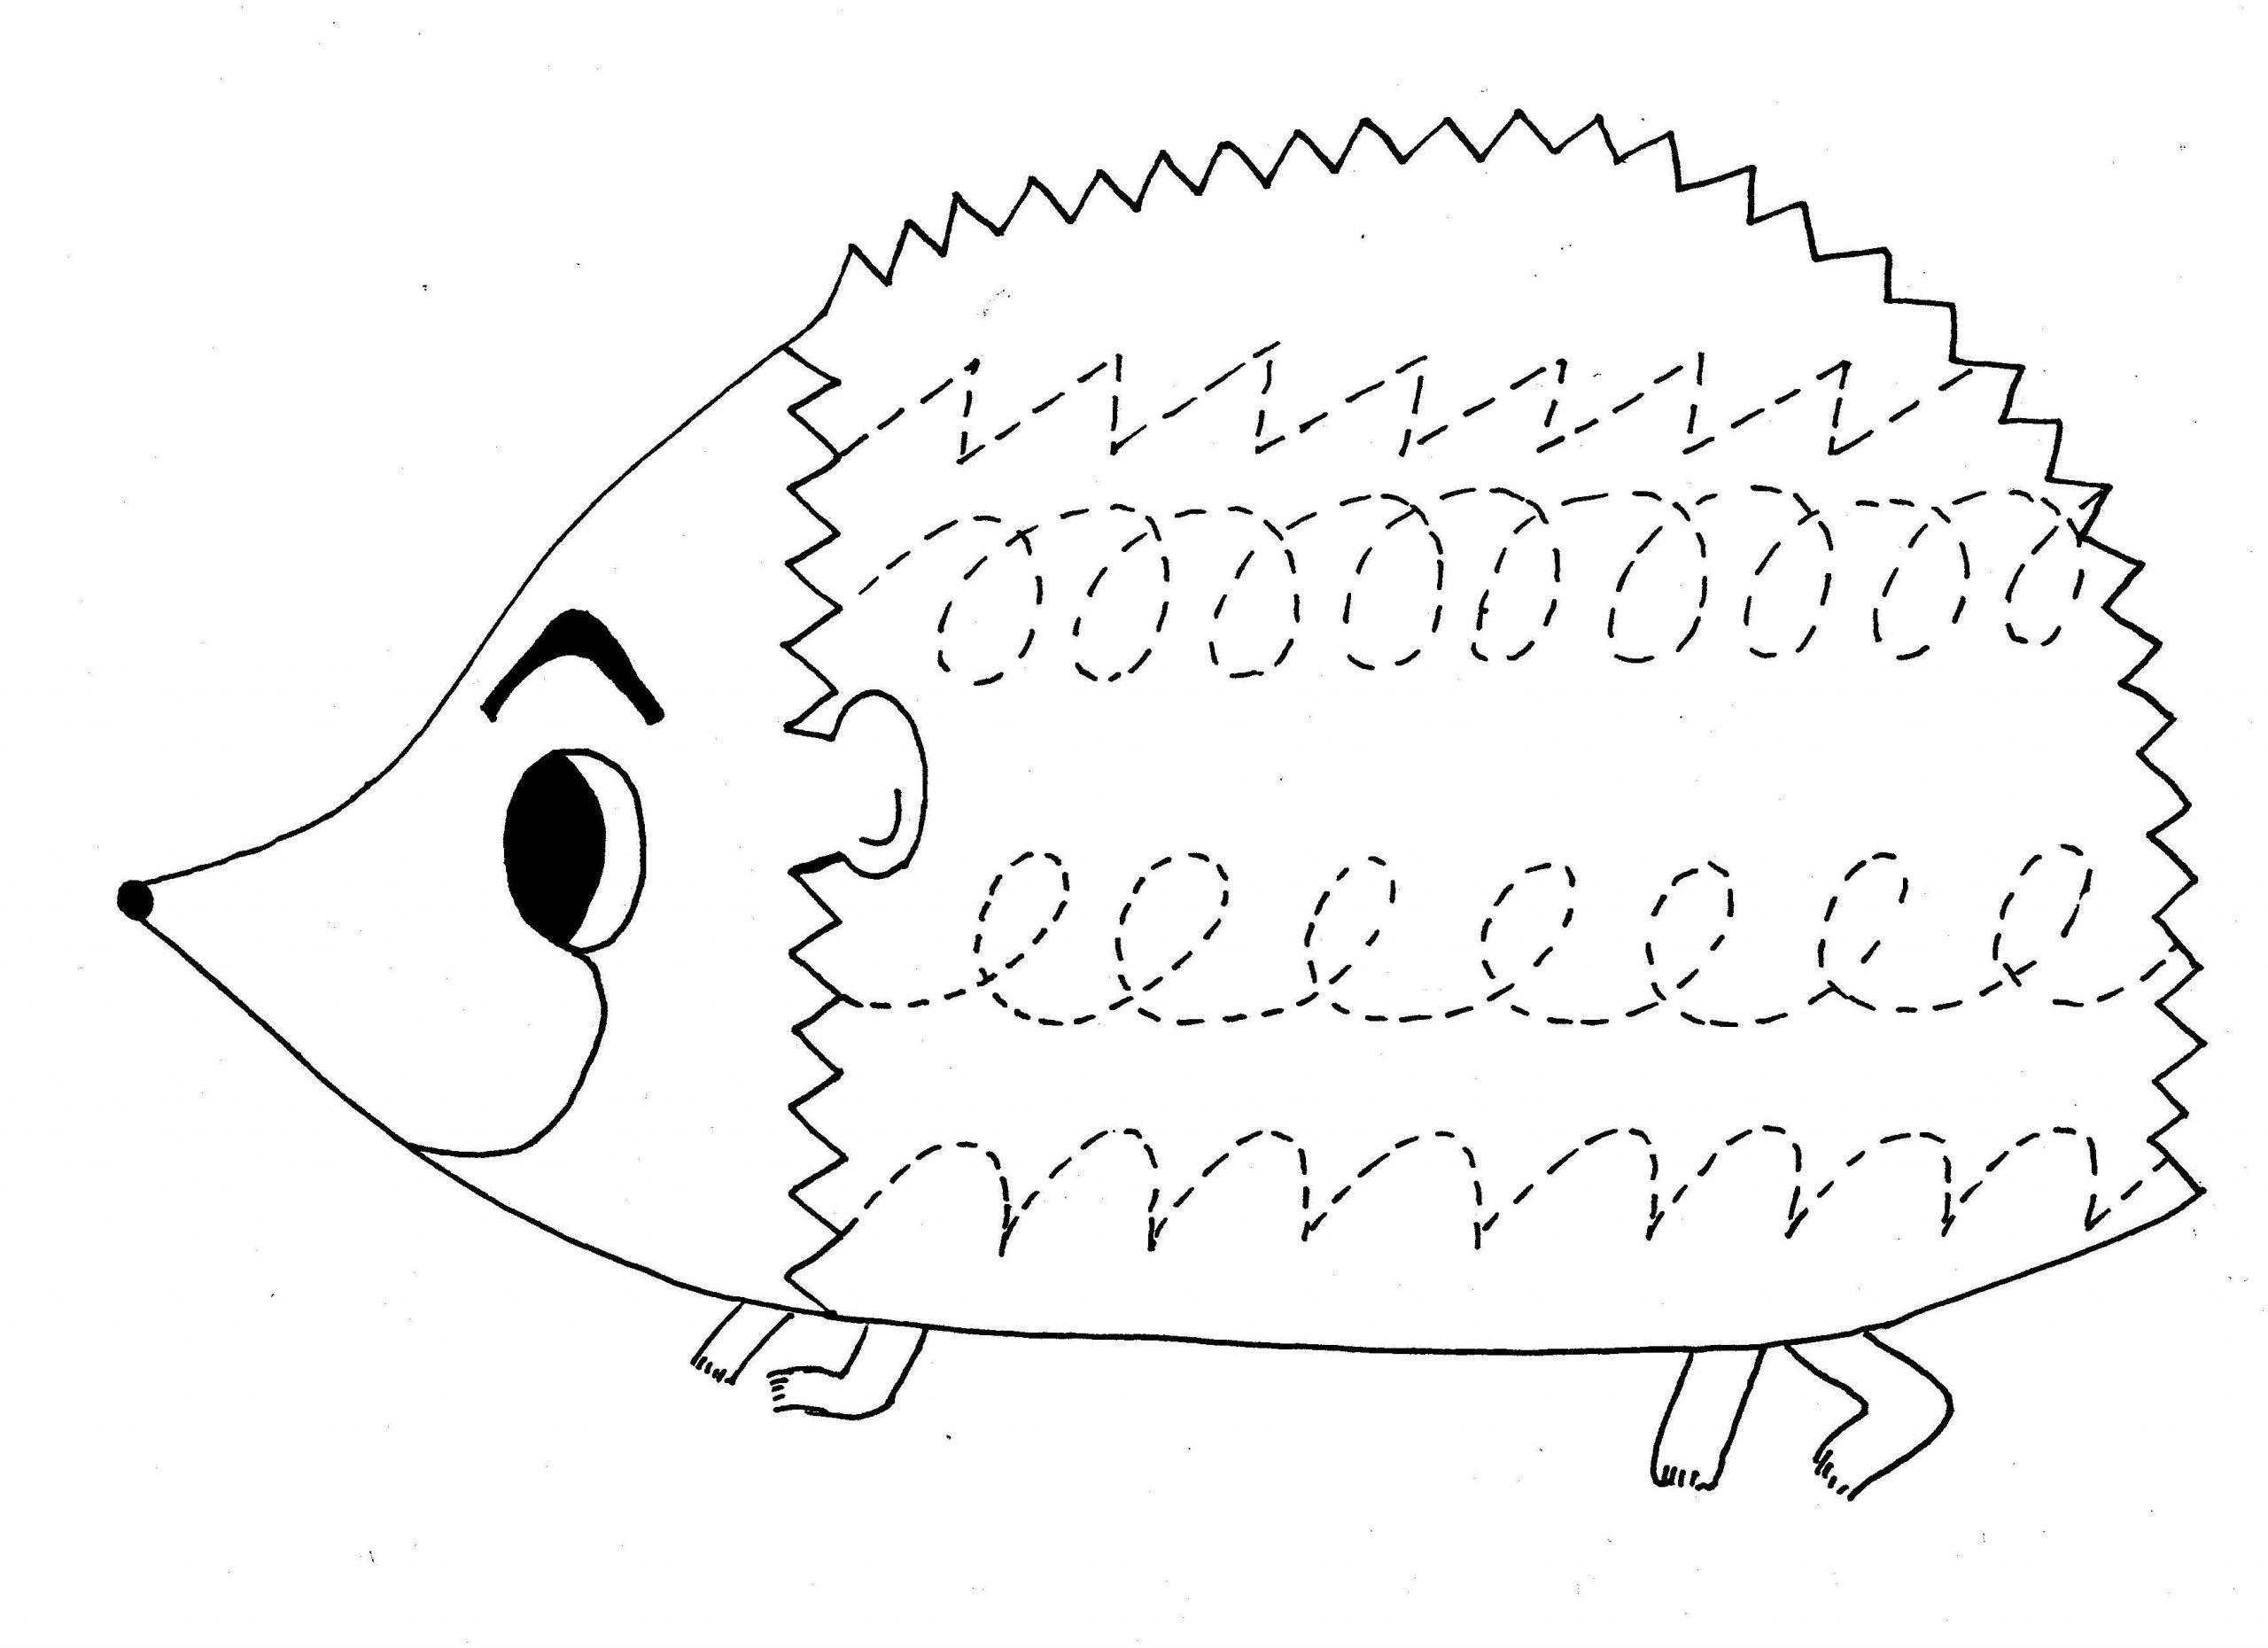 Preschool Worksheets Draw A Line 4